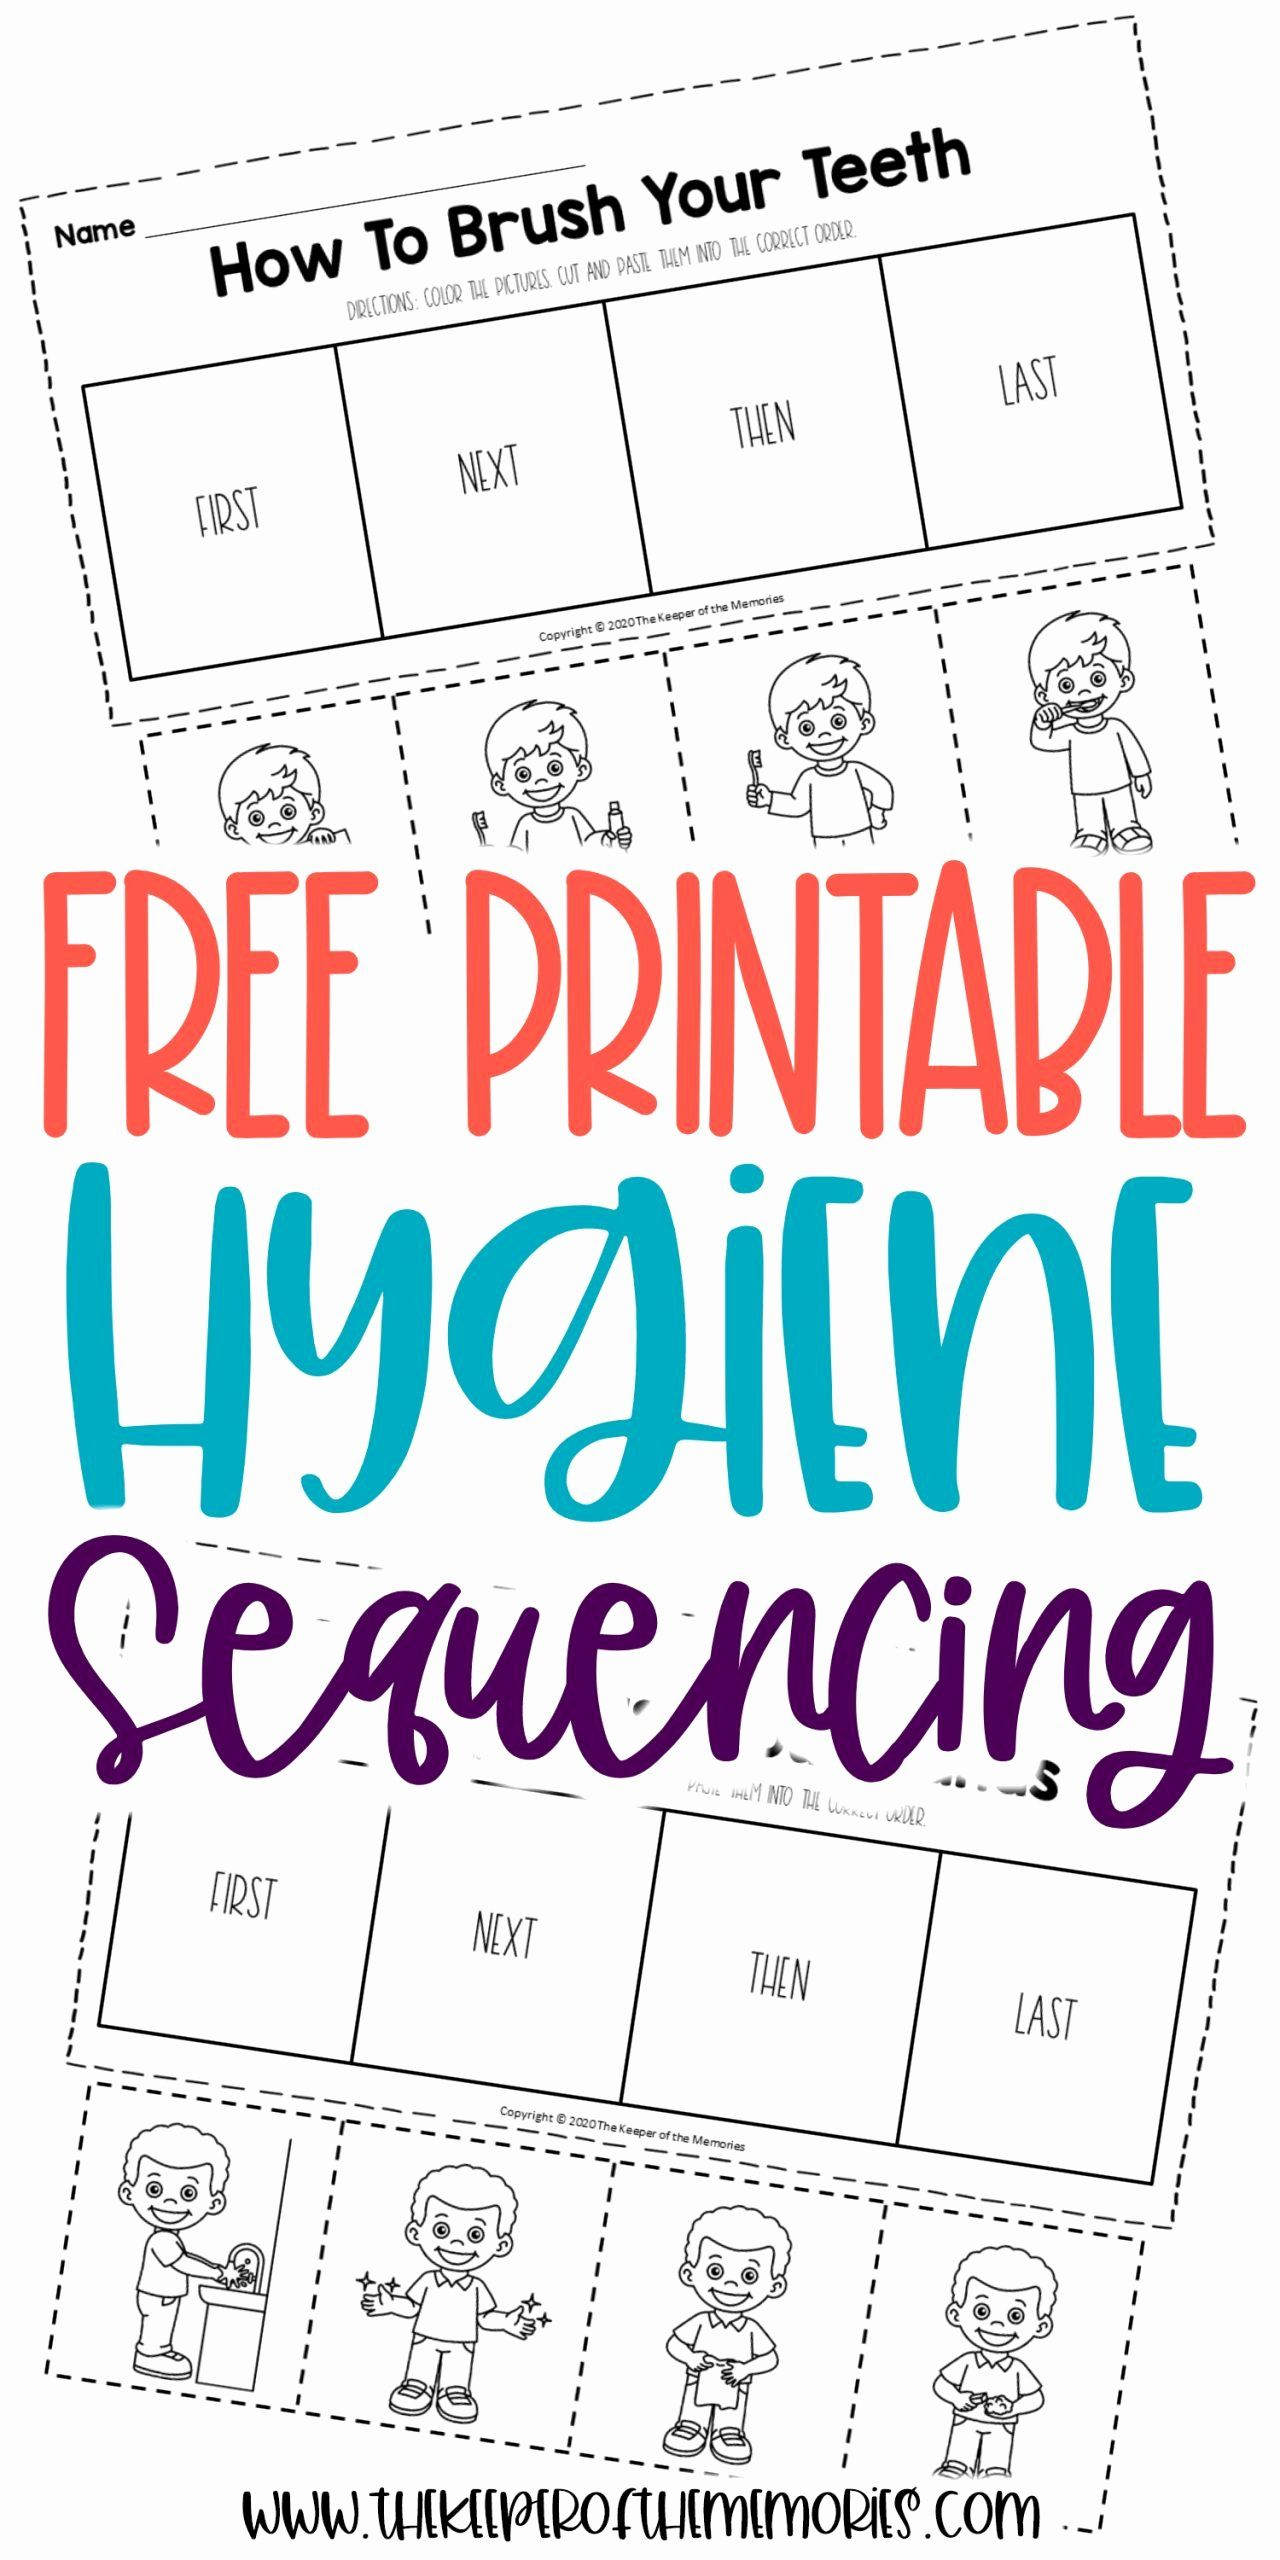 Hygiene Worksheets For Preschoolers Unique Free Printable Preschool Sequencing Workshe Sequencing Worksheets Kids Worksheets Printables Kindergarten Worksheets [ 2560 x 1280 Pixel ]